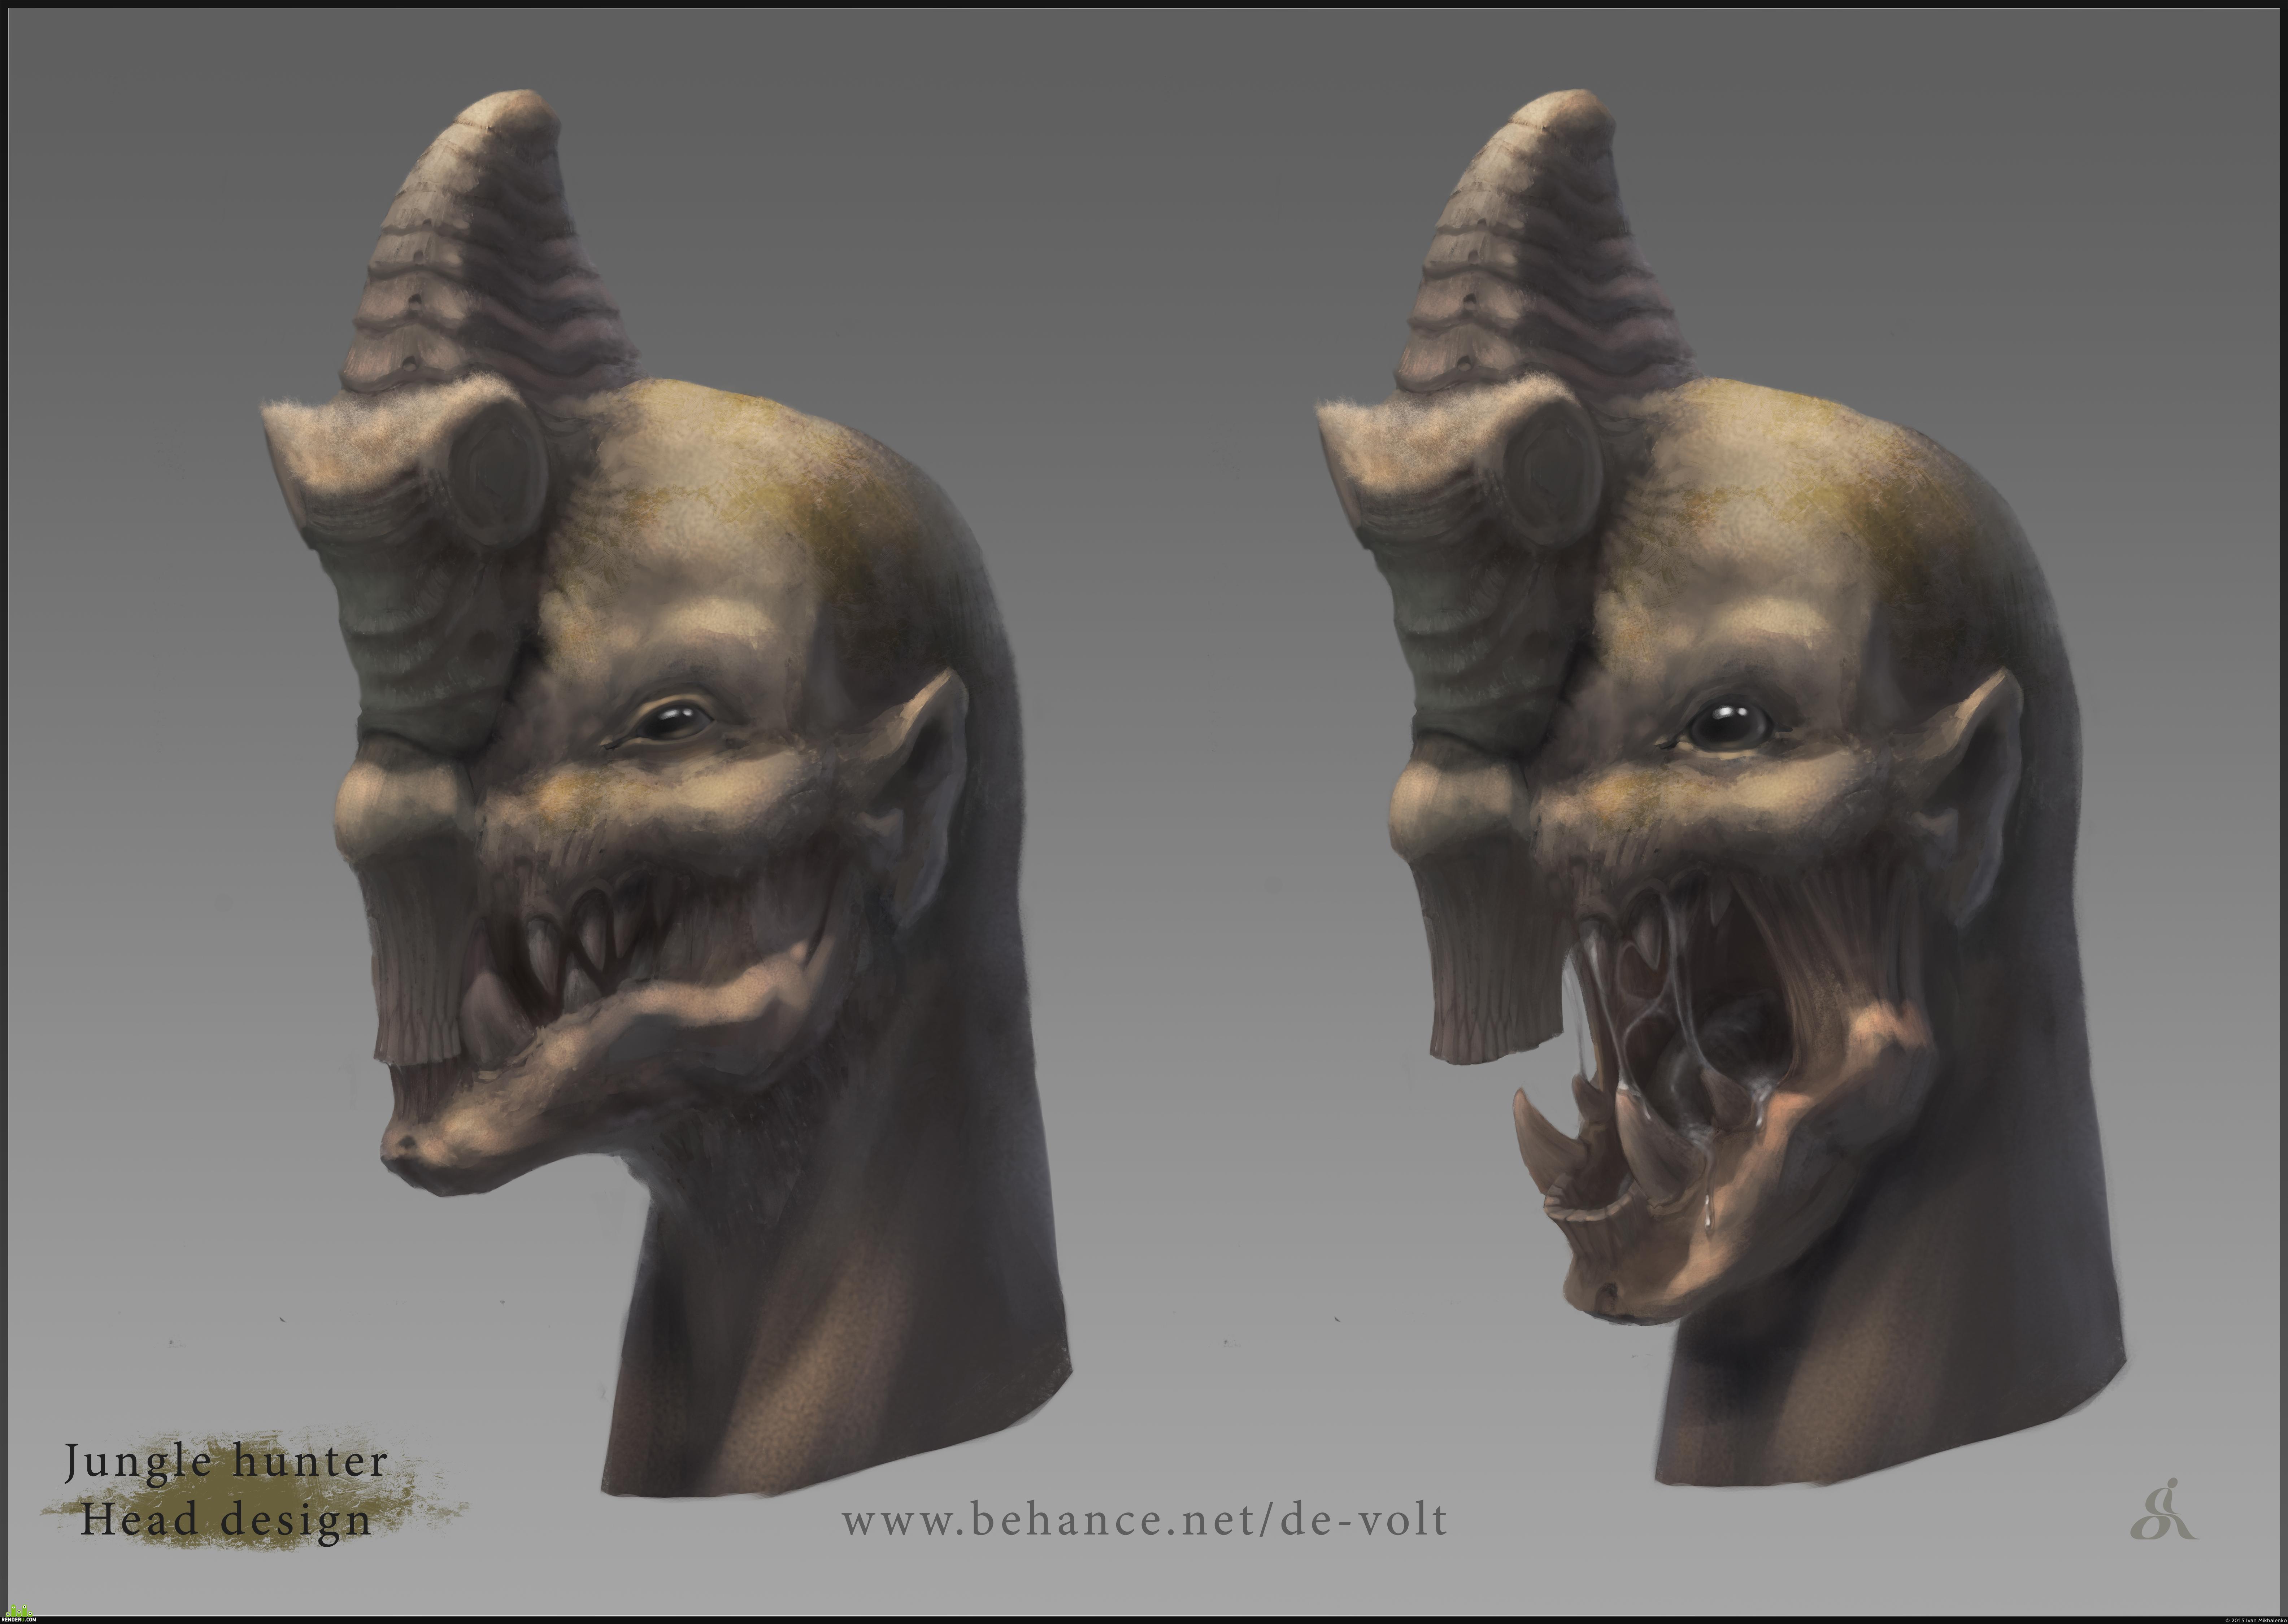 preview Дизайн головы охотника джунглей